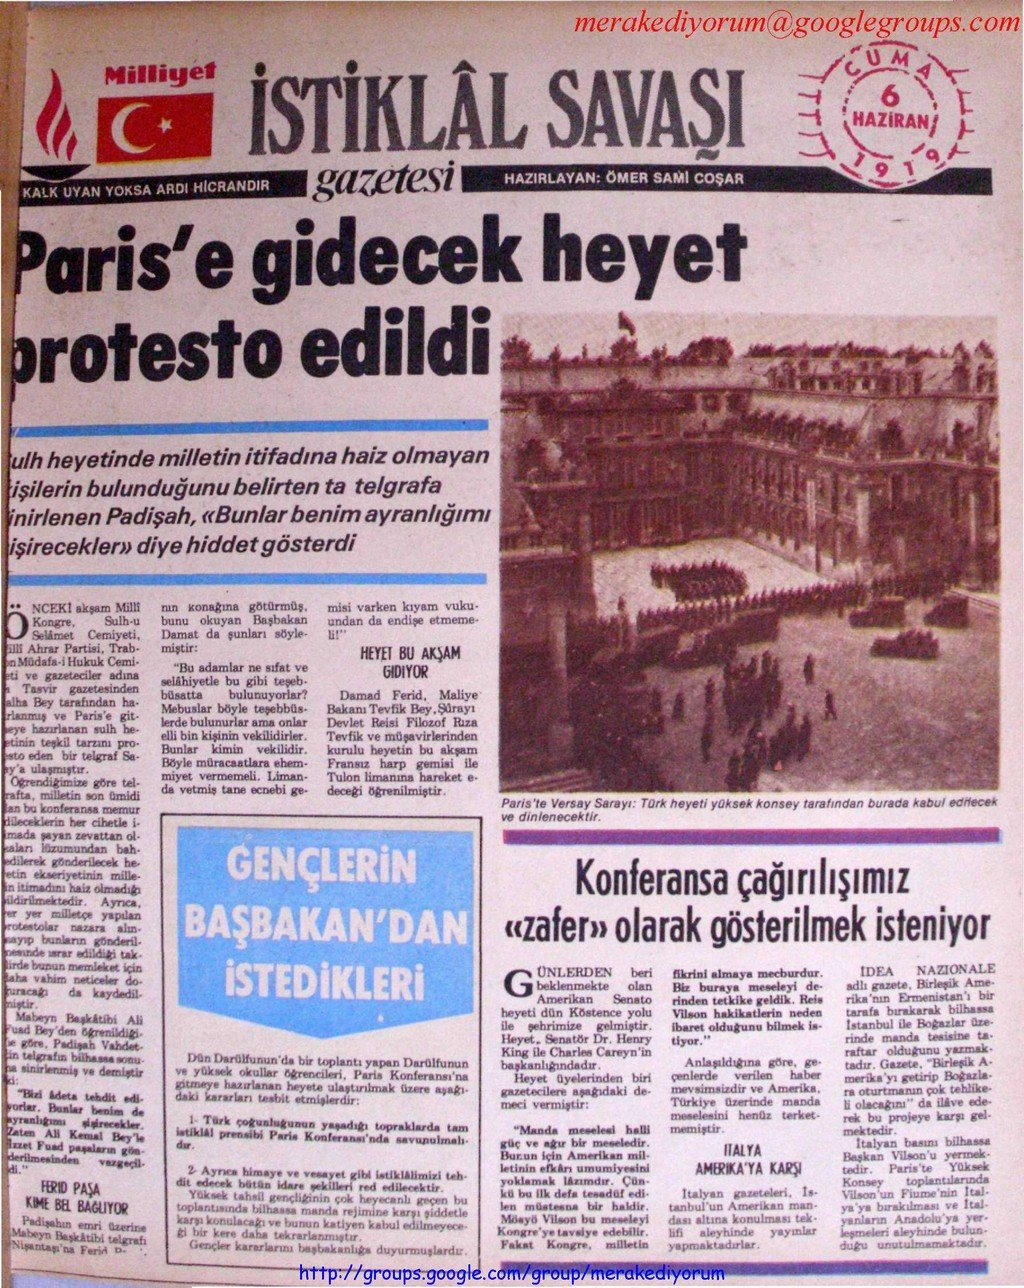 istiklal savaşı gazetesi - 06 Haziran 1919